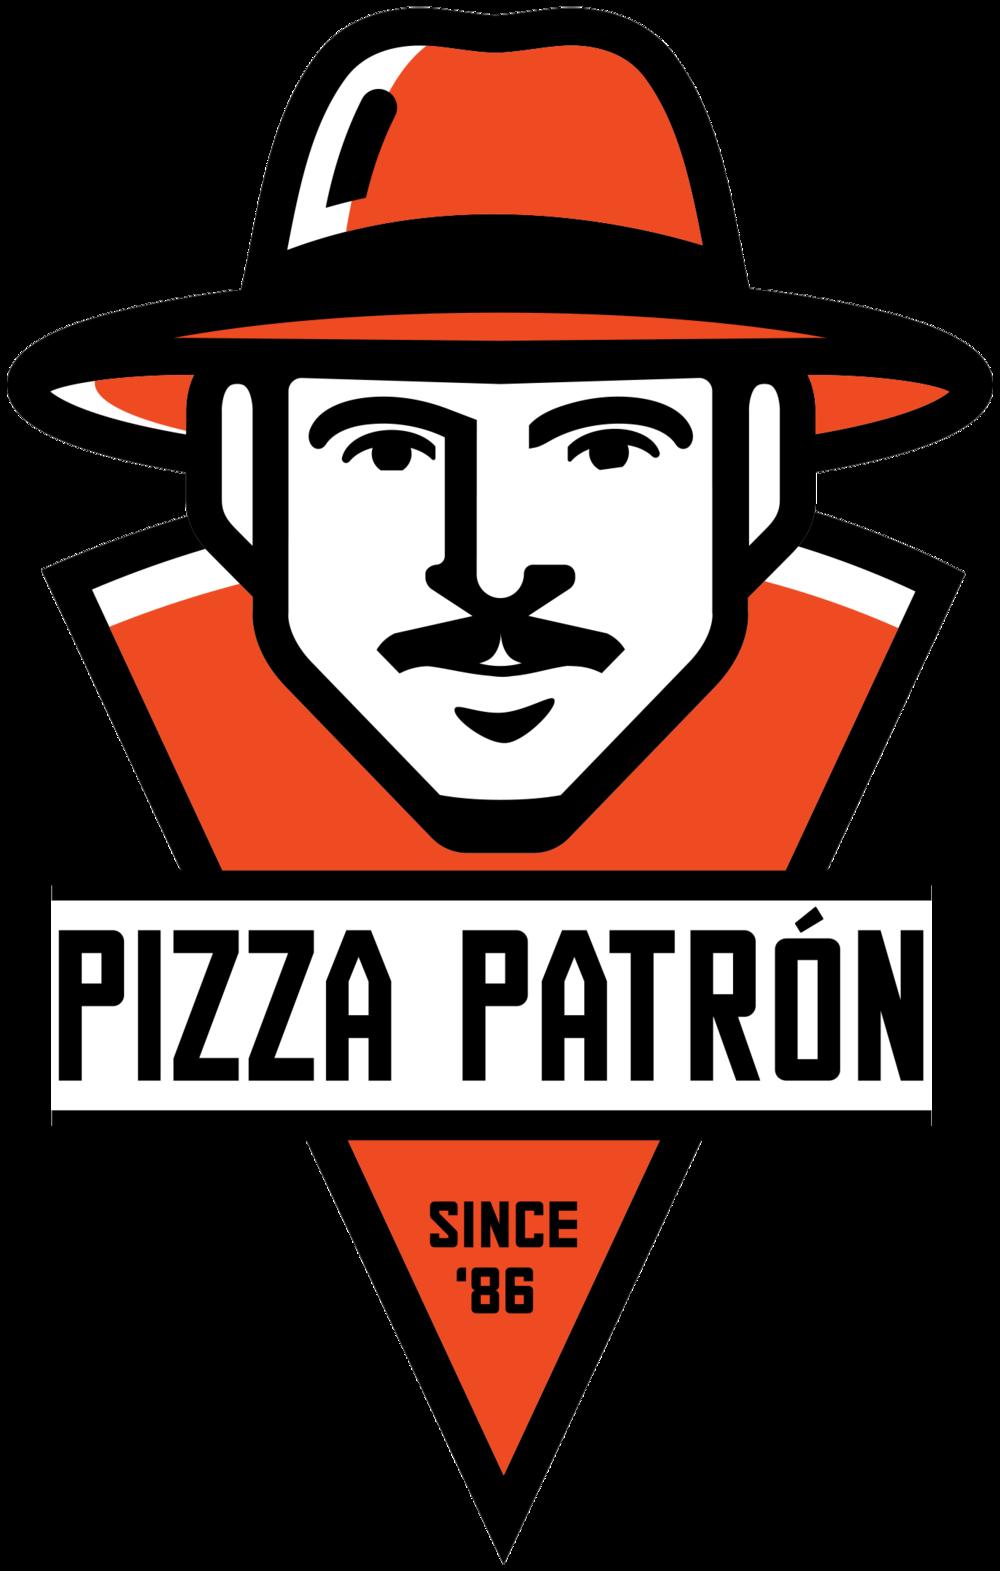 PizzaPatron_logo_vert_RGB.png